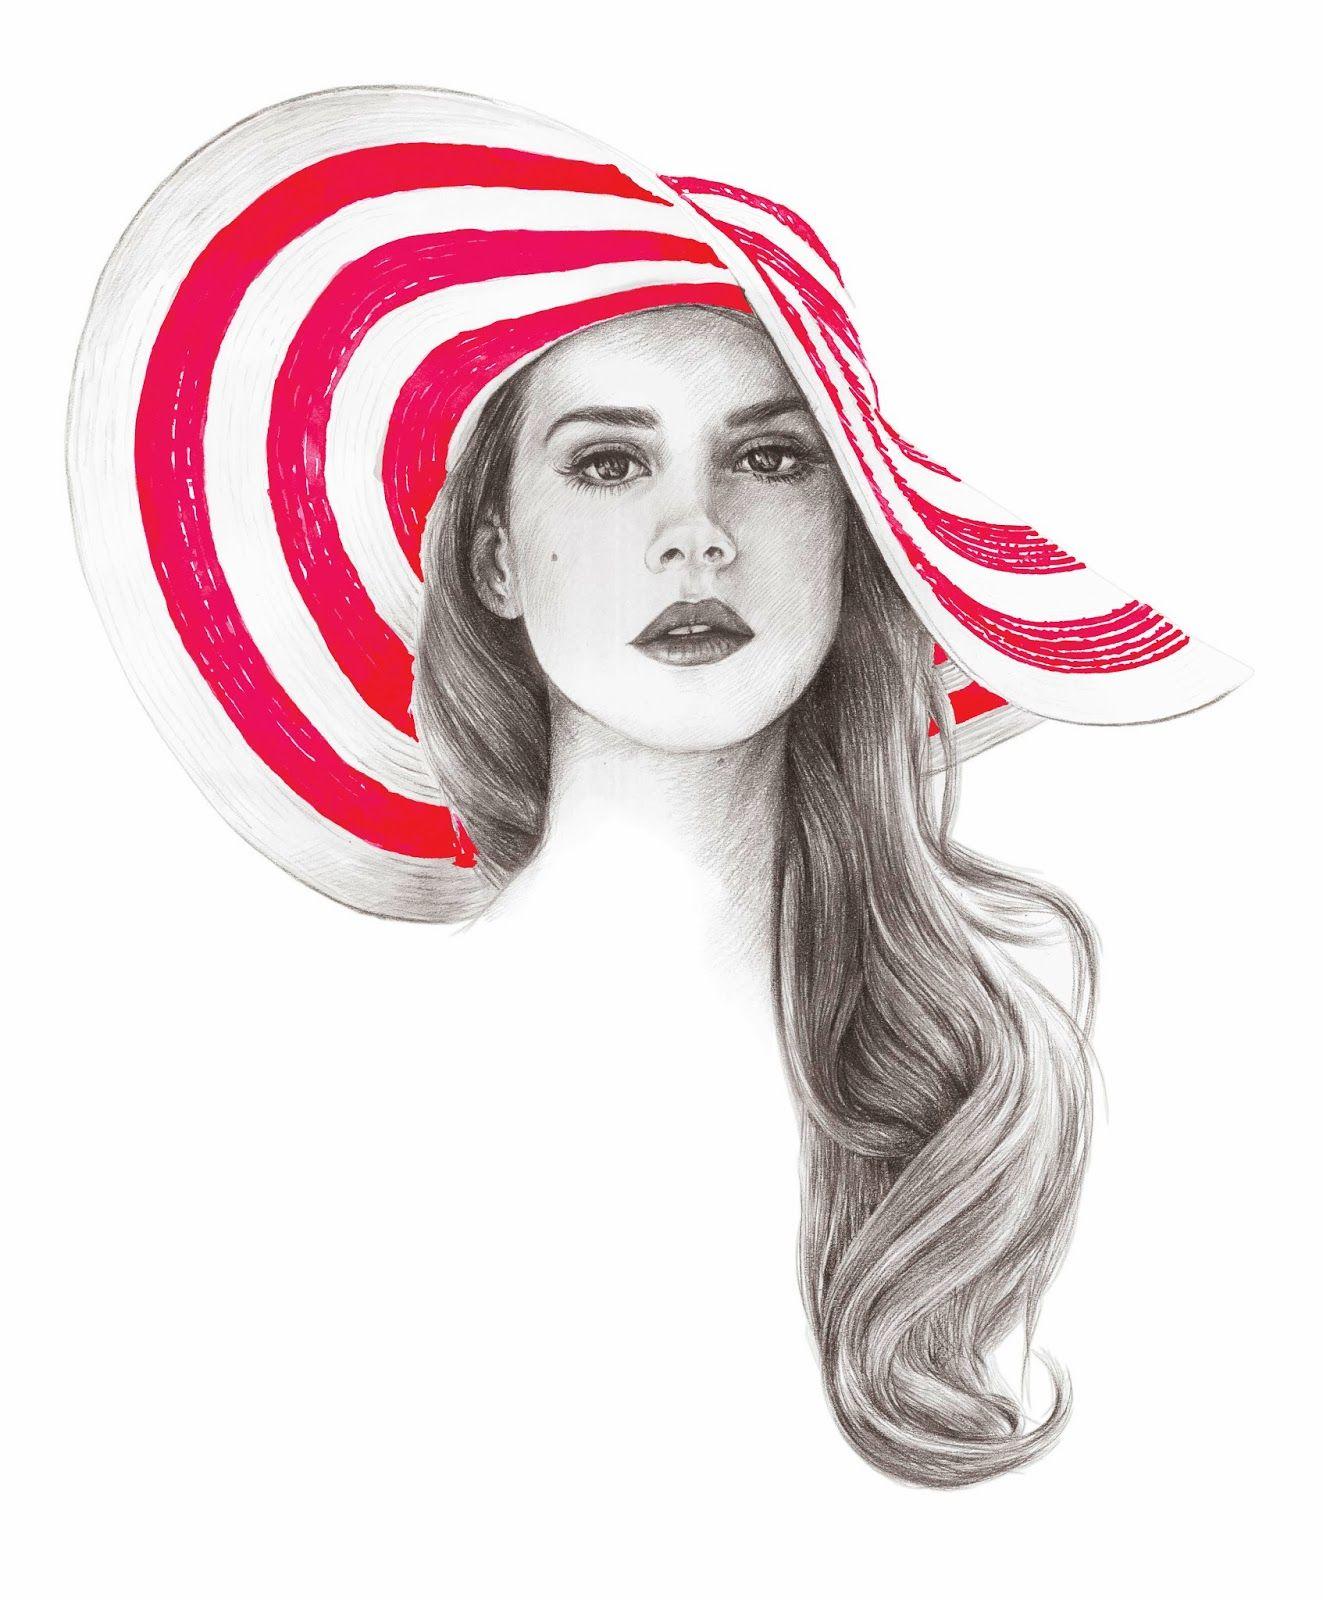 COOLRISTA: Lana Del Rey Art Print | Inspiration ...